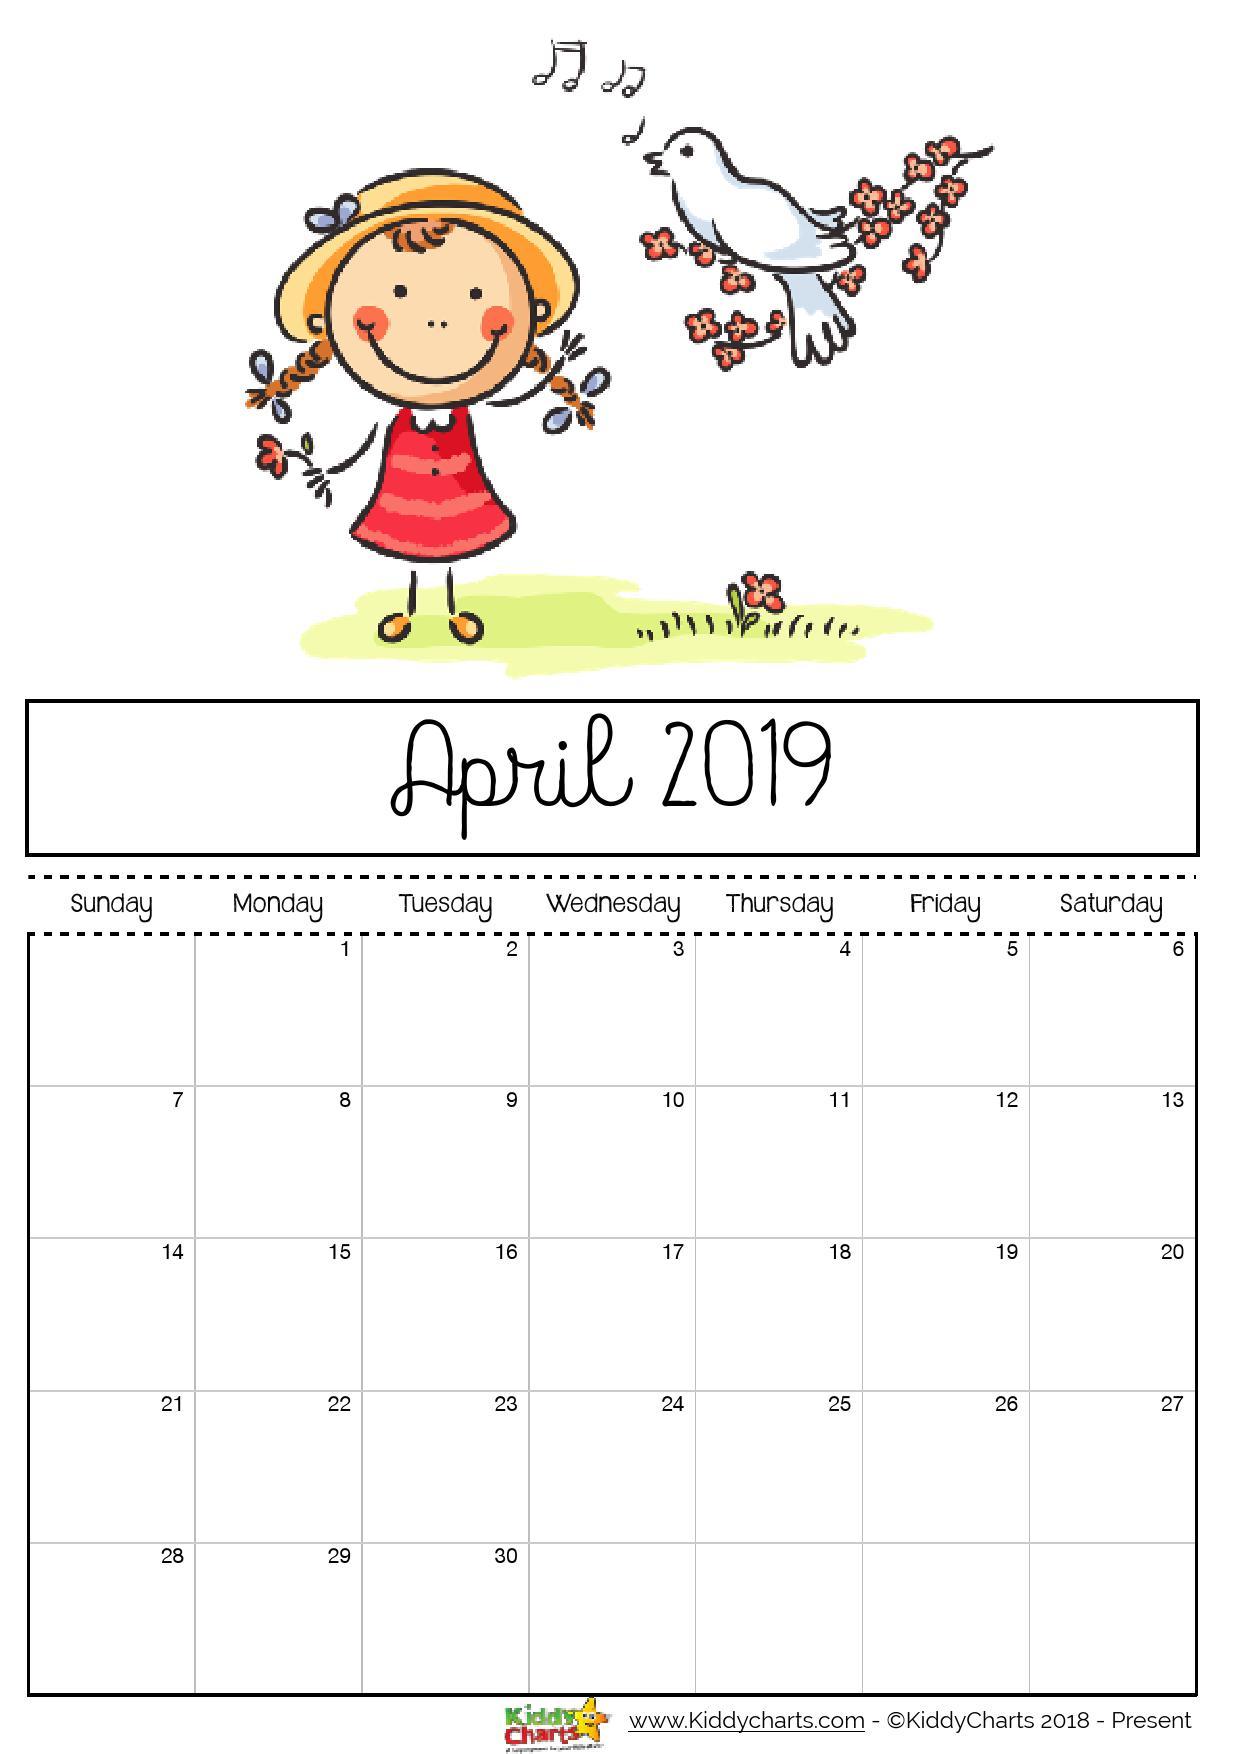 April 2019 Calendar Page For Kids